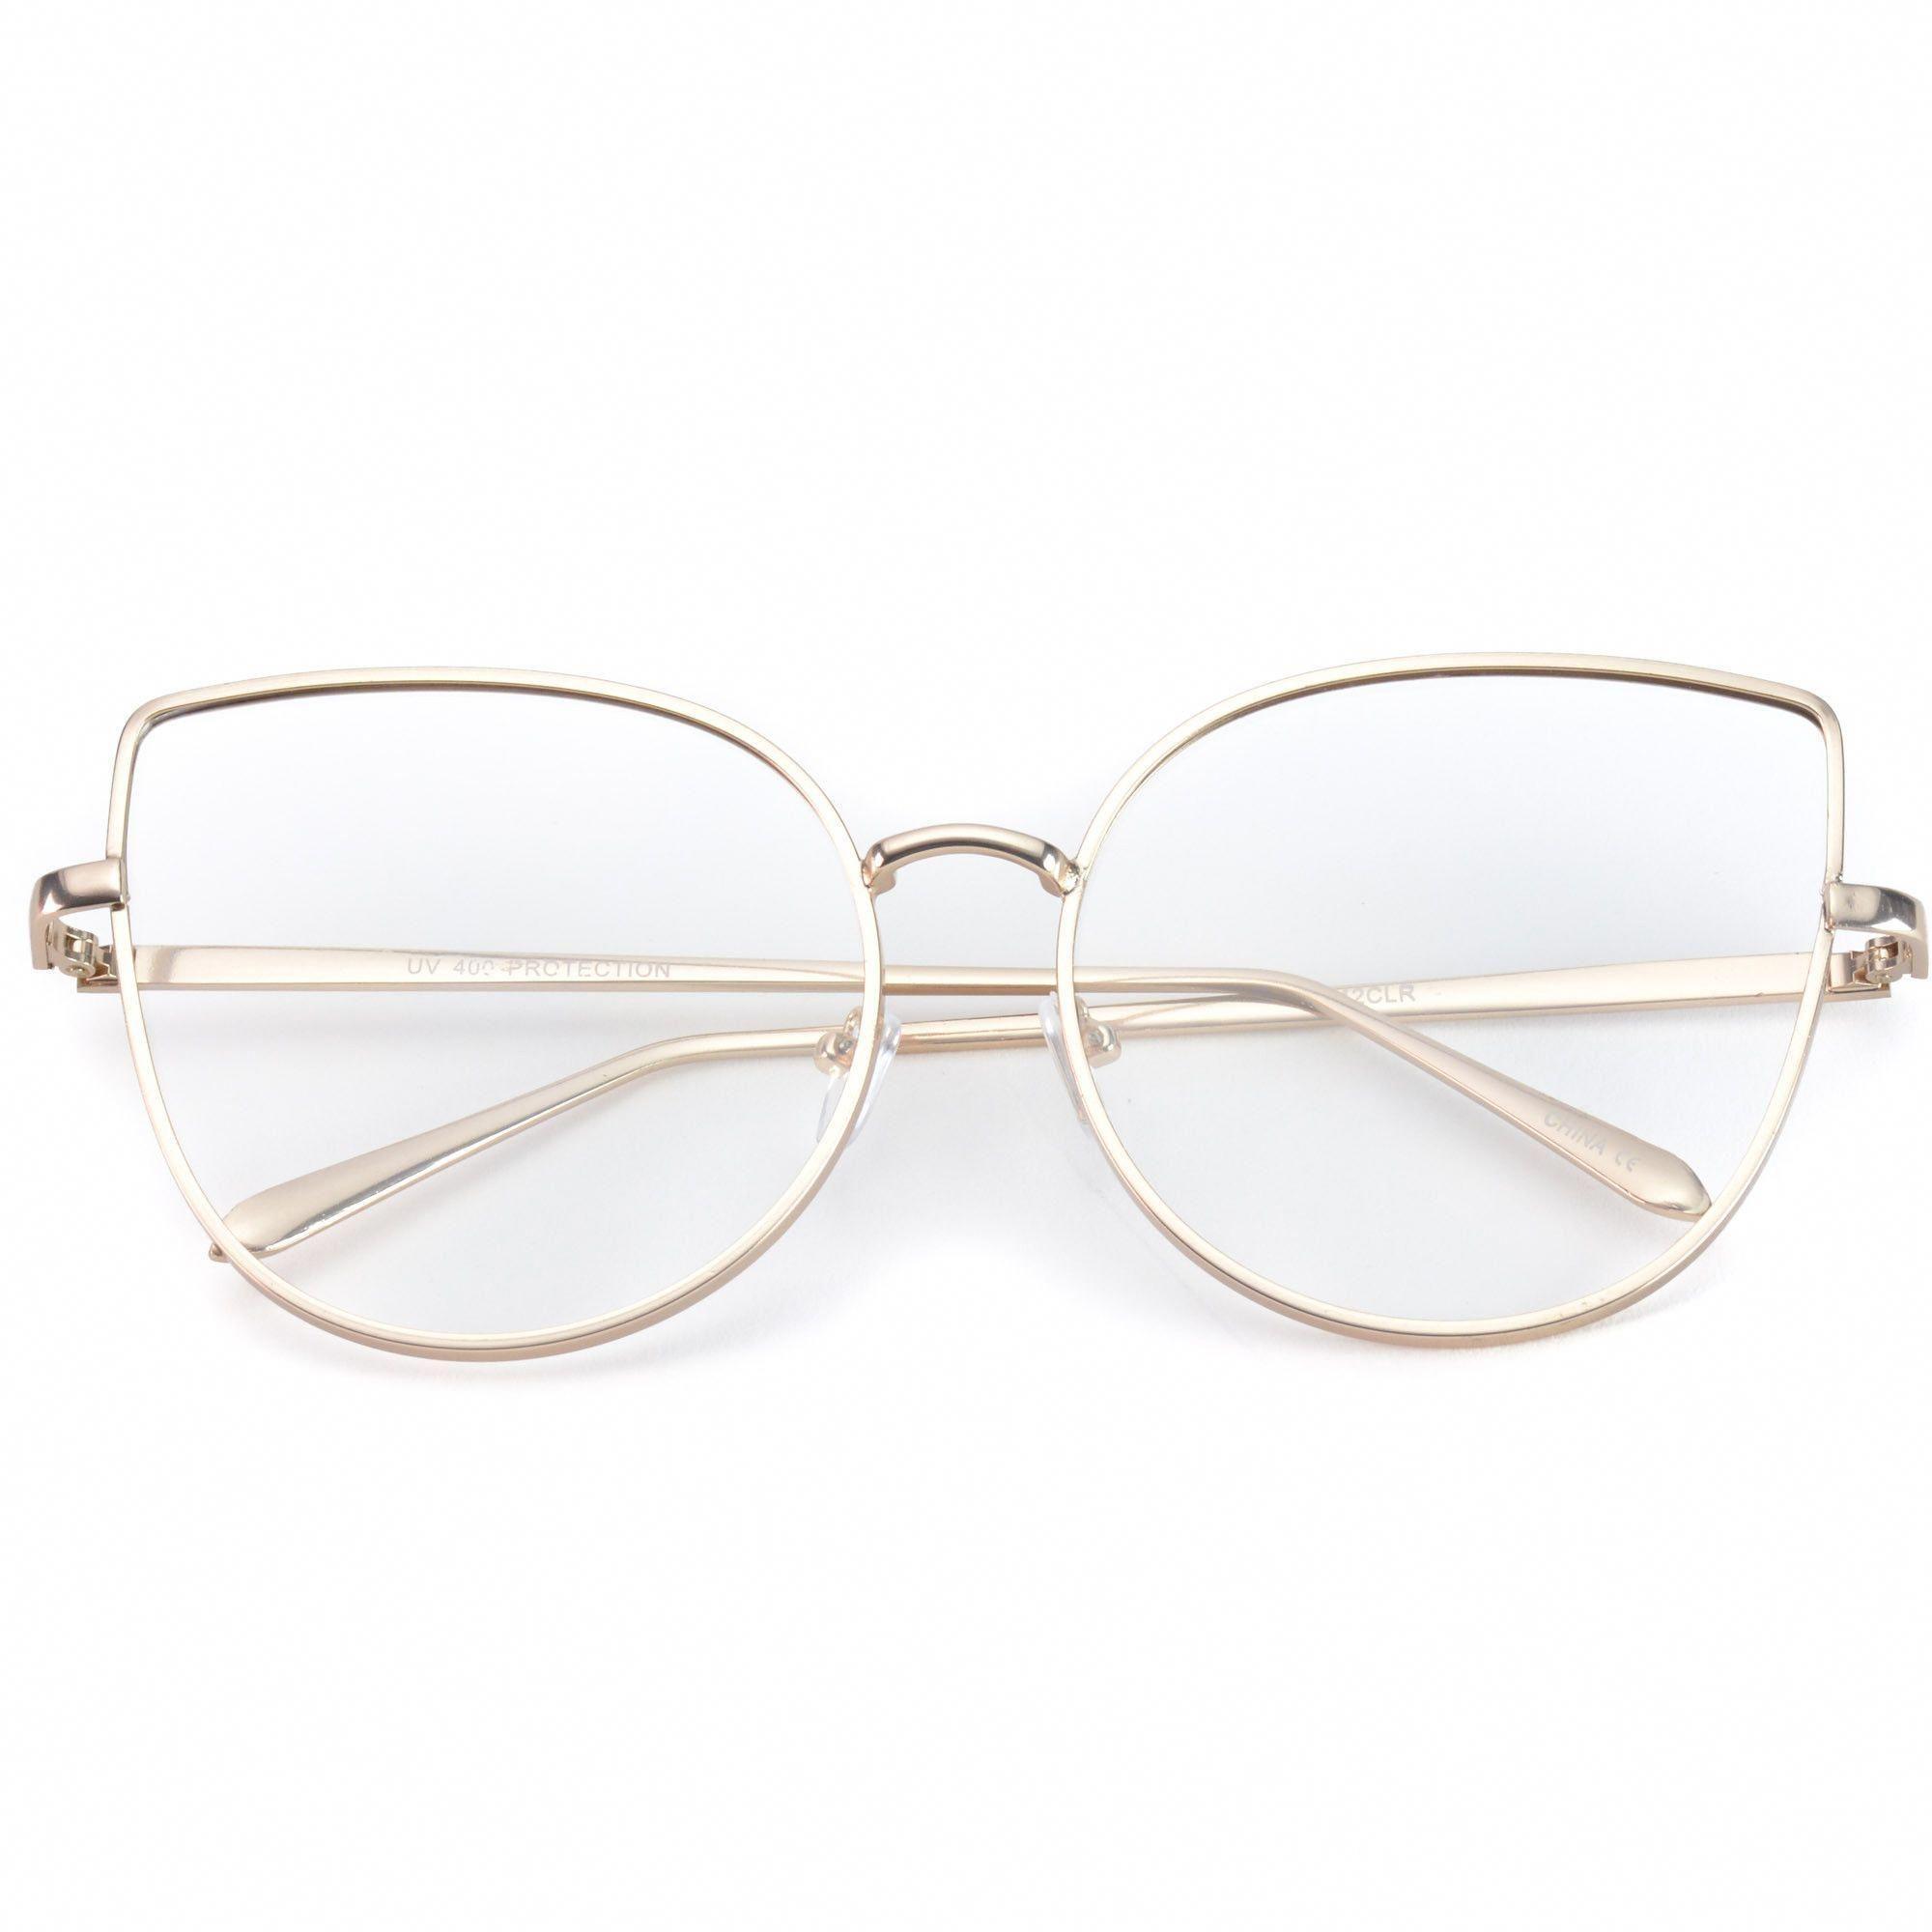 dd80c5025a  AntiAgingVitaminCSerum Product ID 8377494228   HowToImproveVisionWithoutGlasses Oversized Glasses